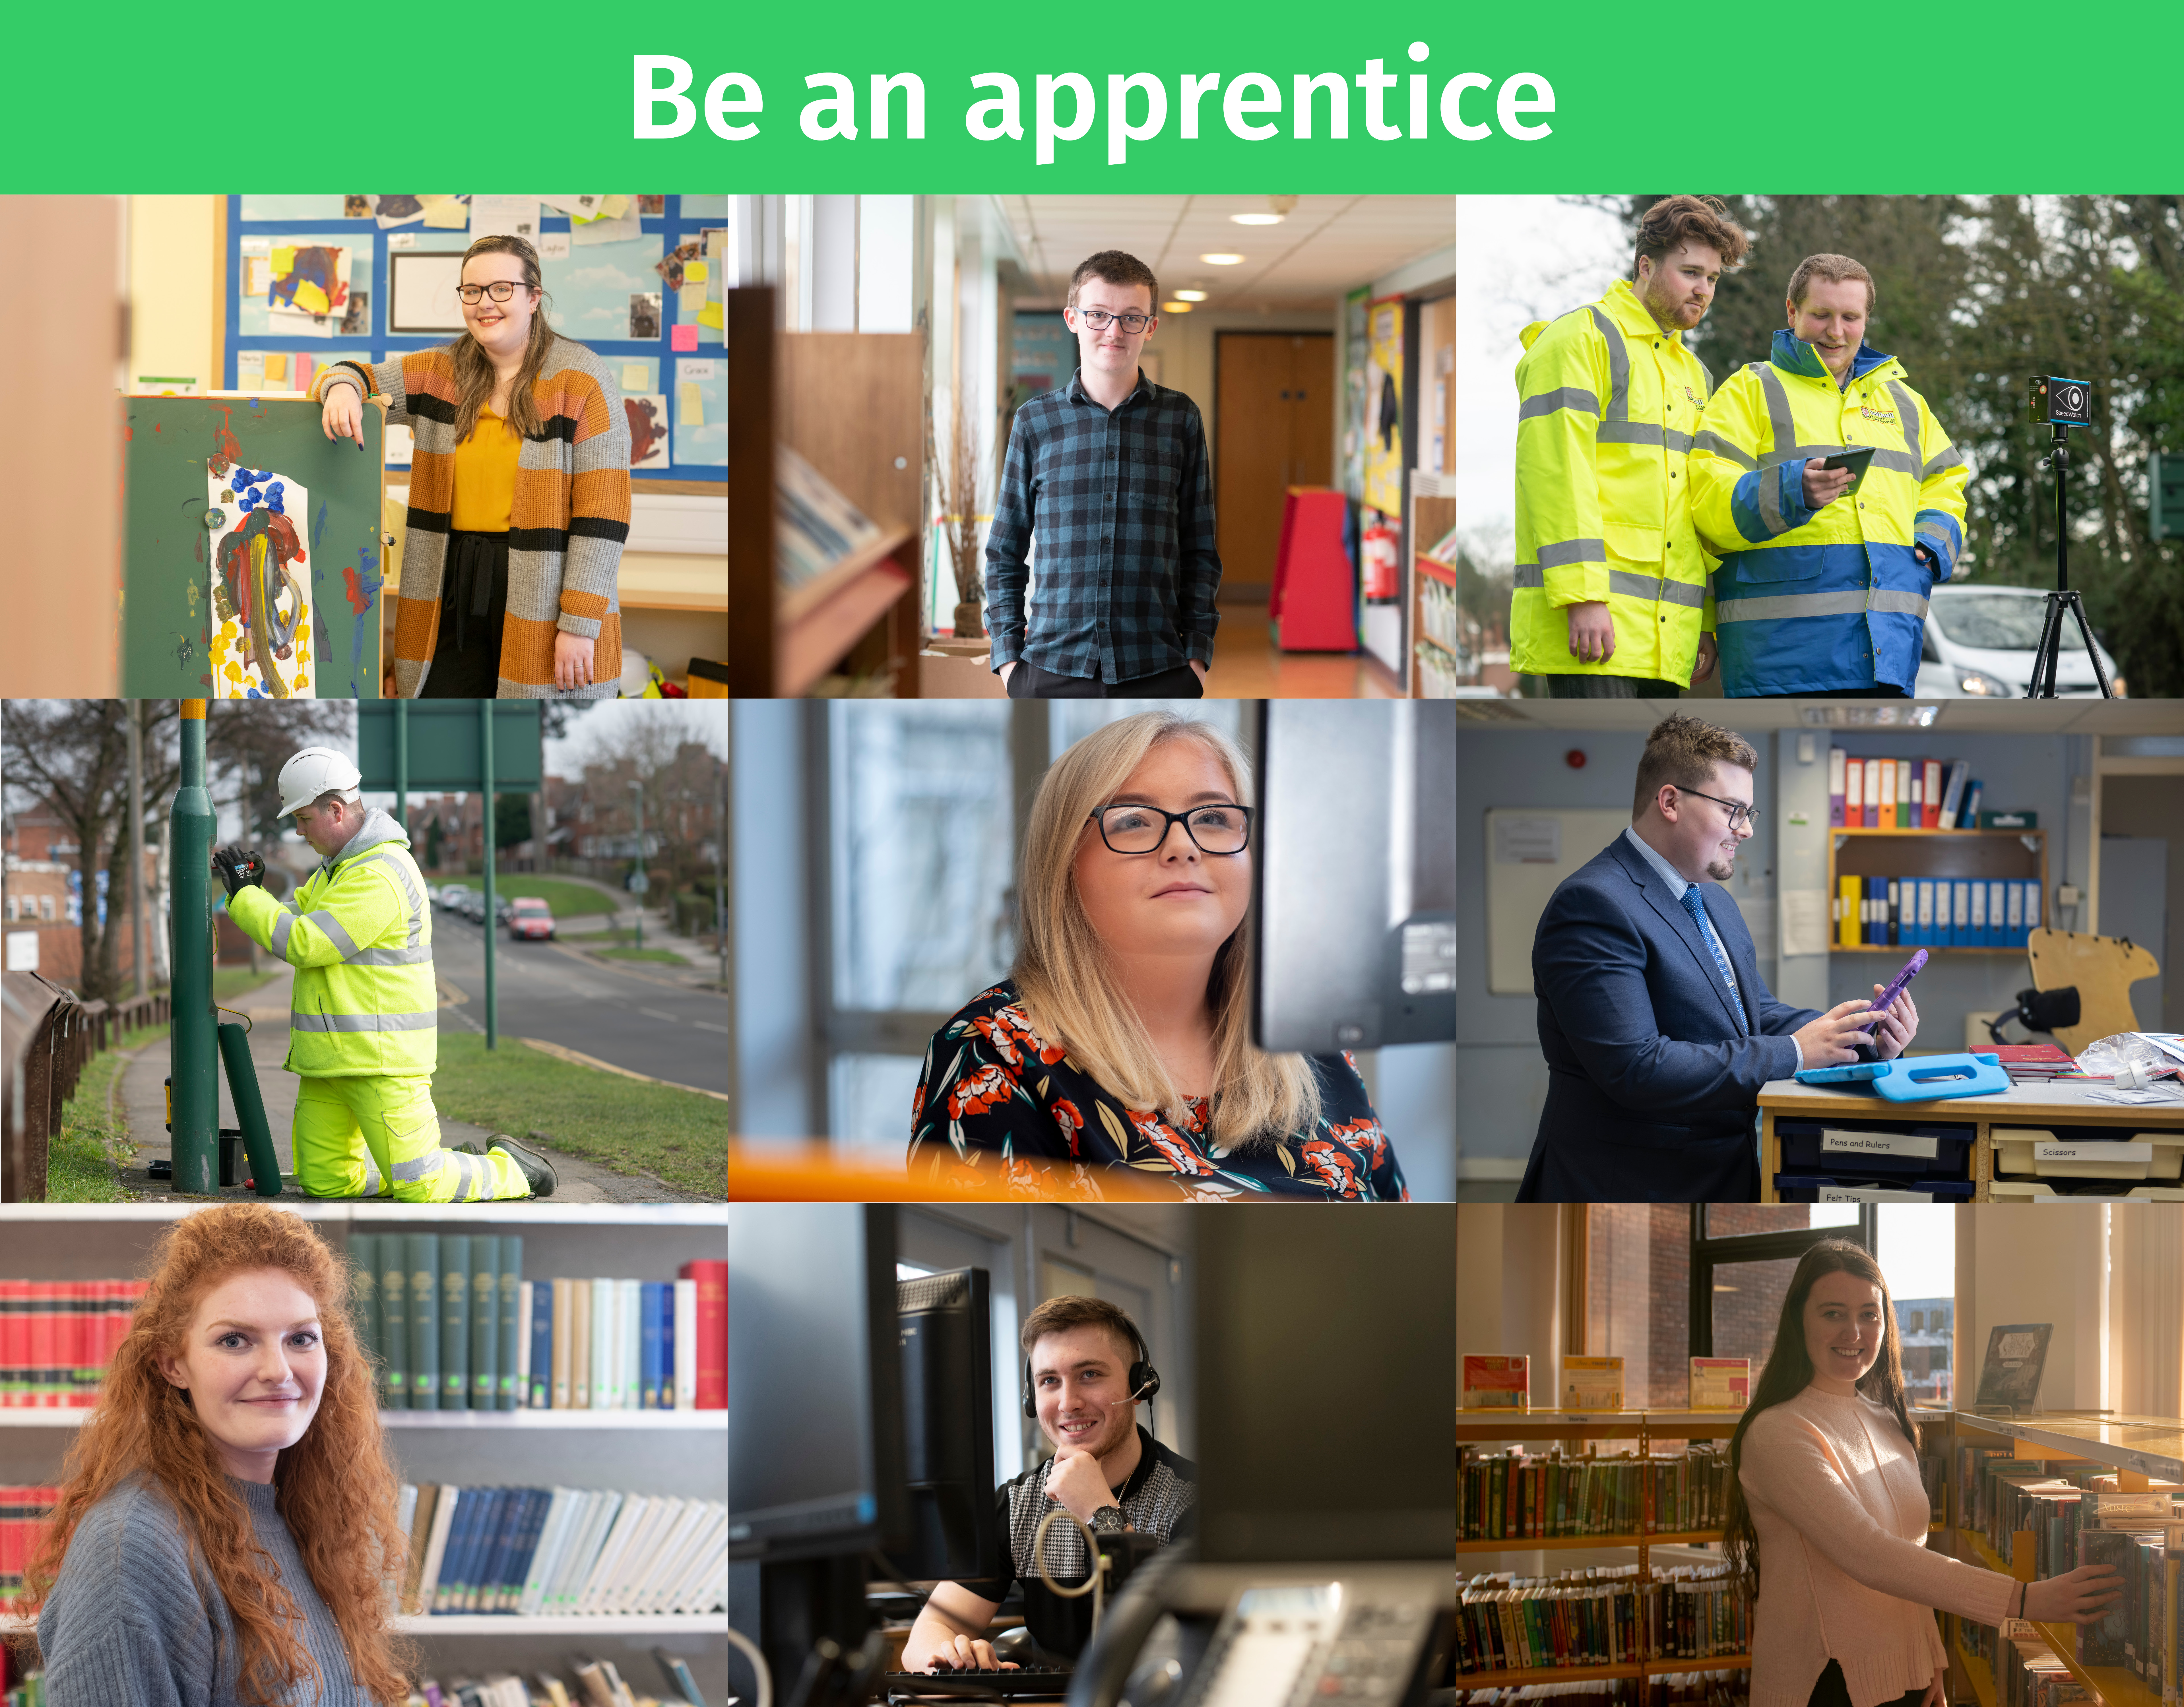 Apprentice picture montage